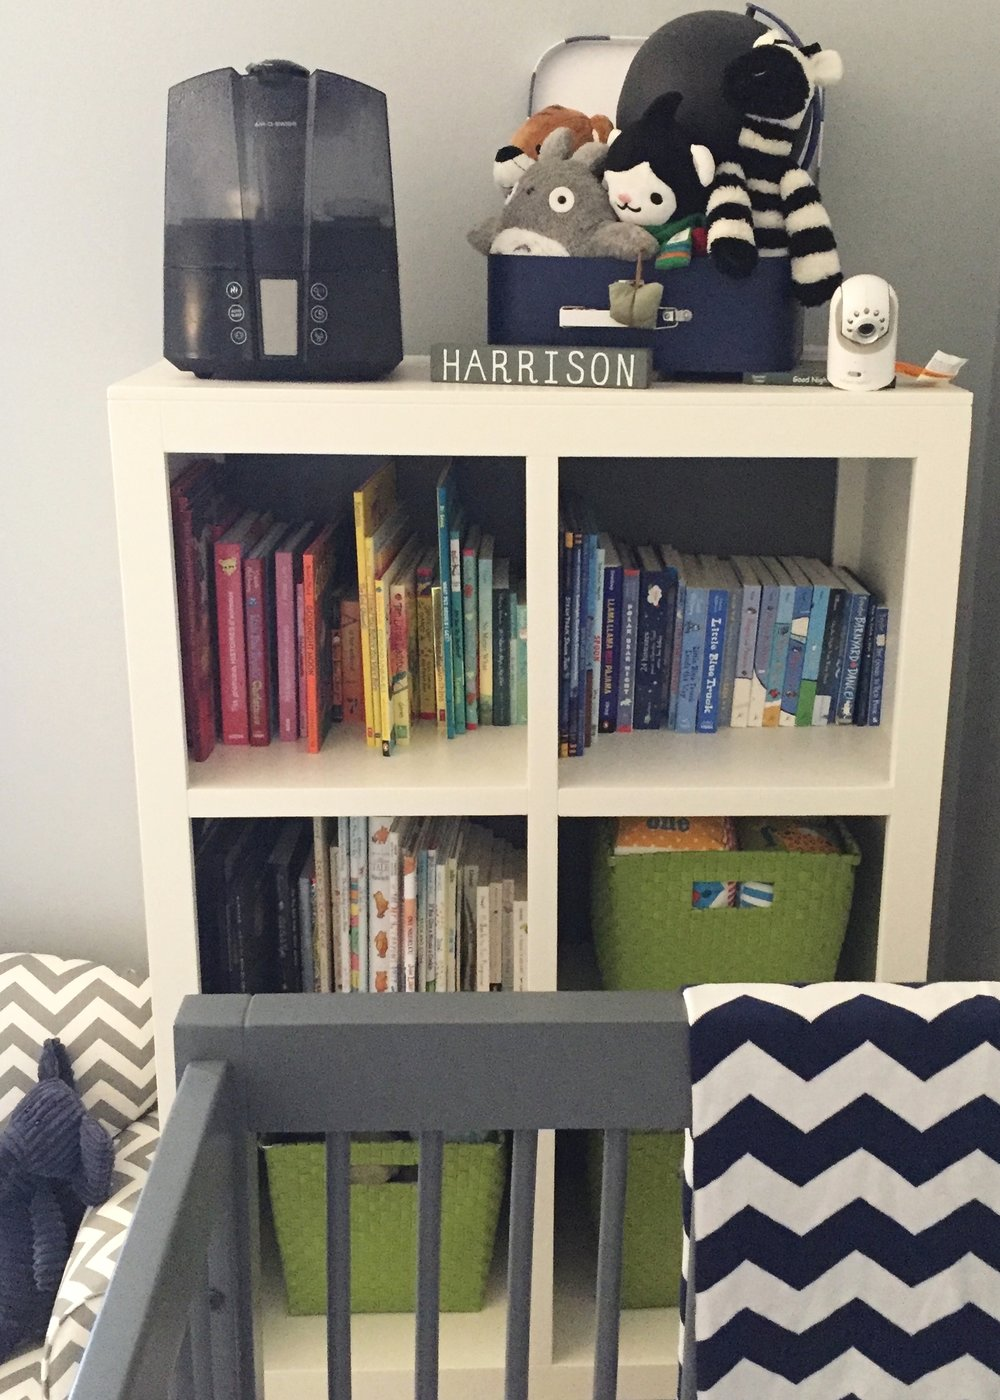 -Harrison's Bookshelf.jpg